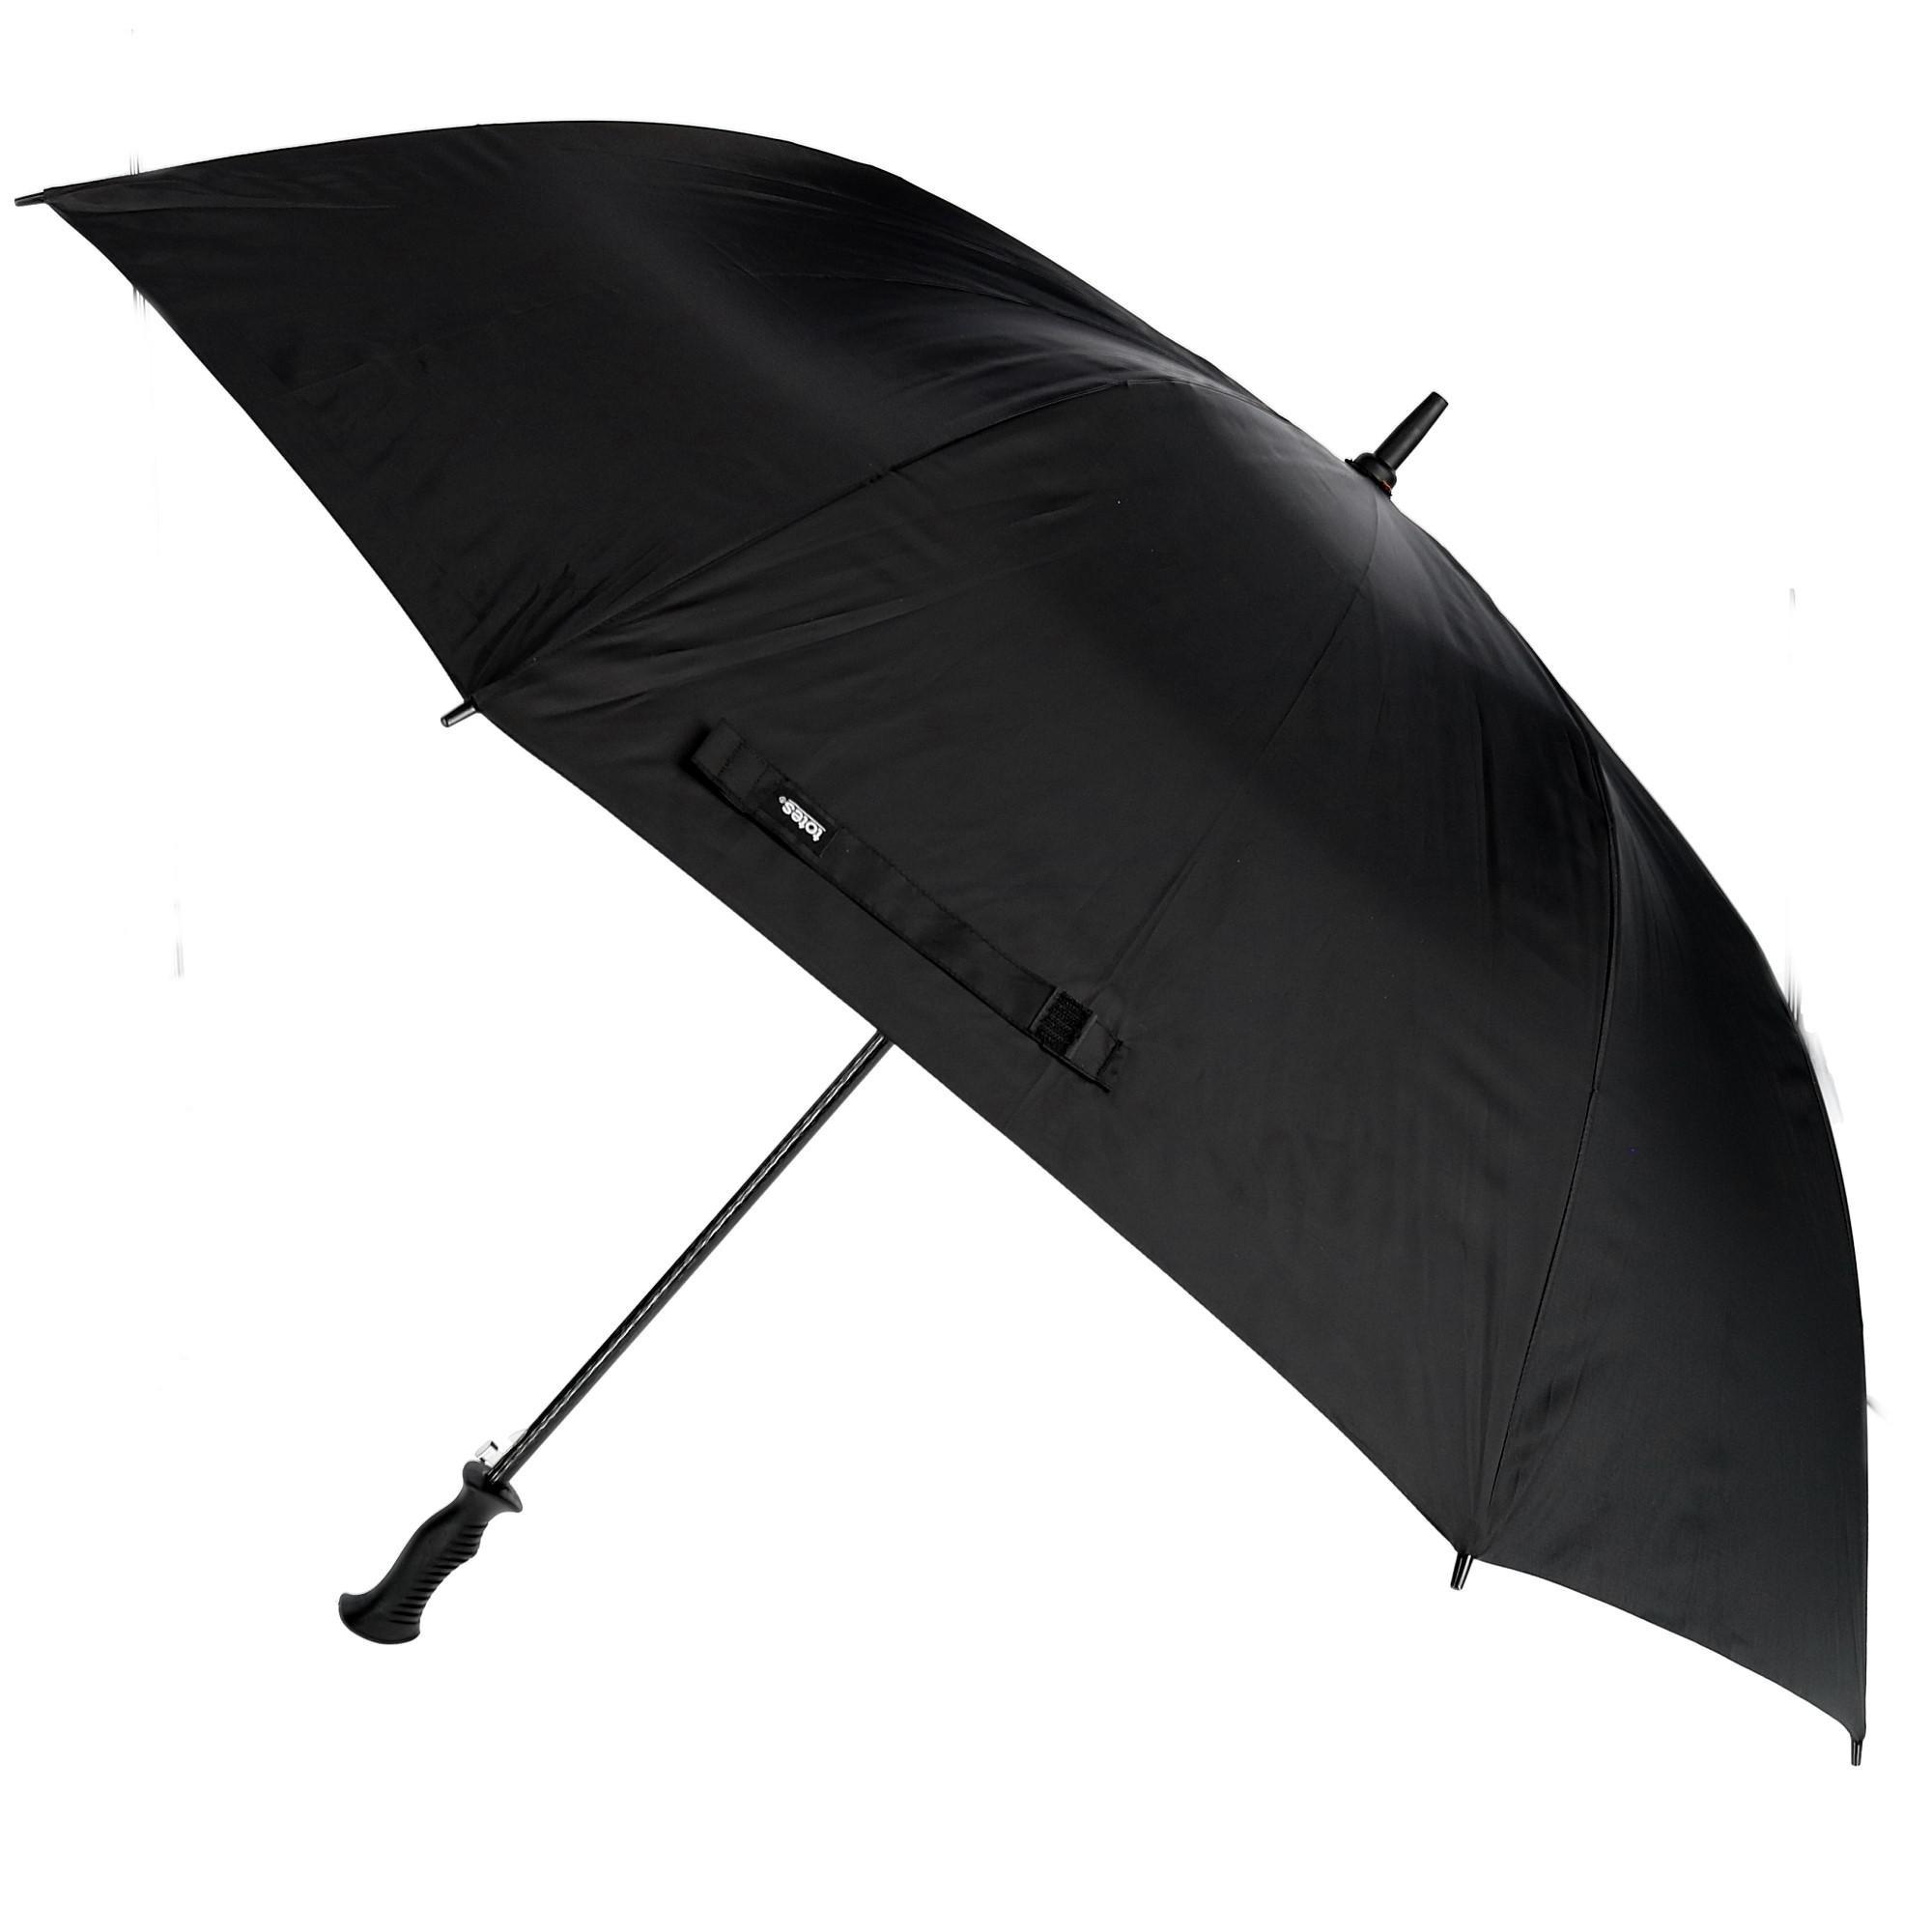 Totes Auto Open Golf Stick Umbrella with Sun Protection, Black